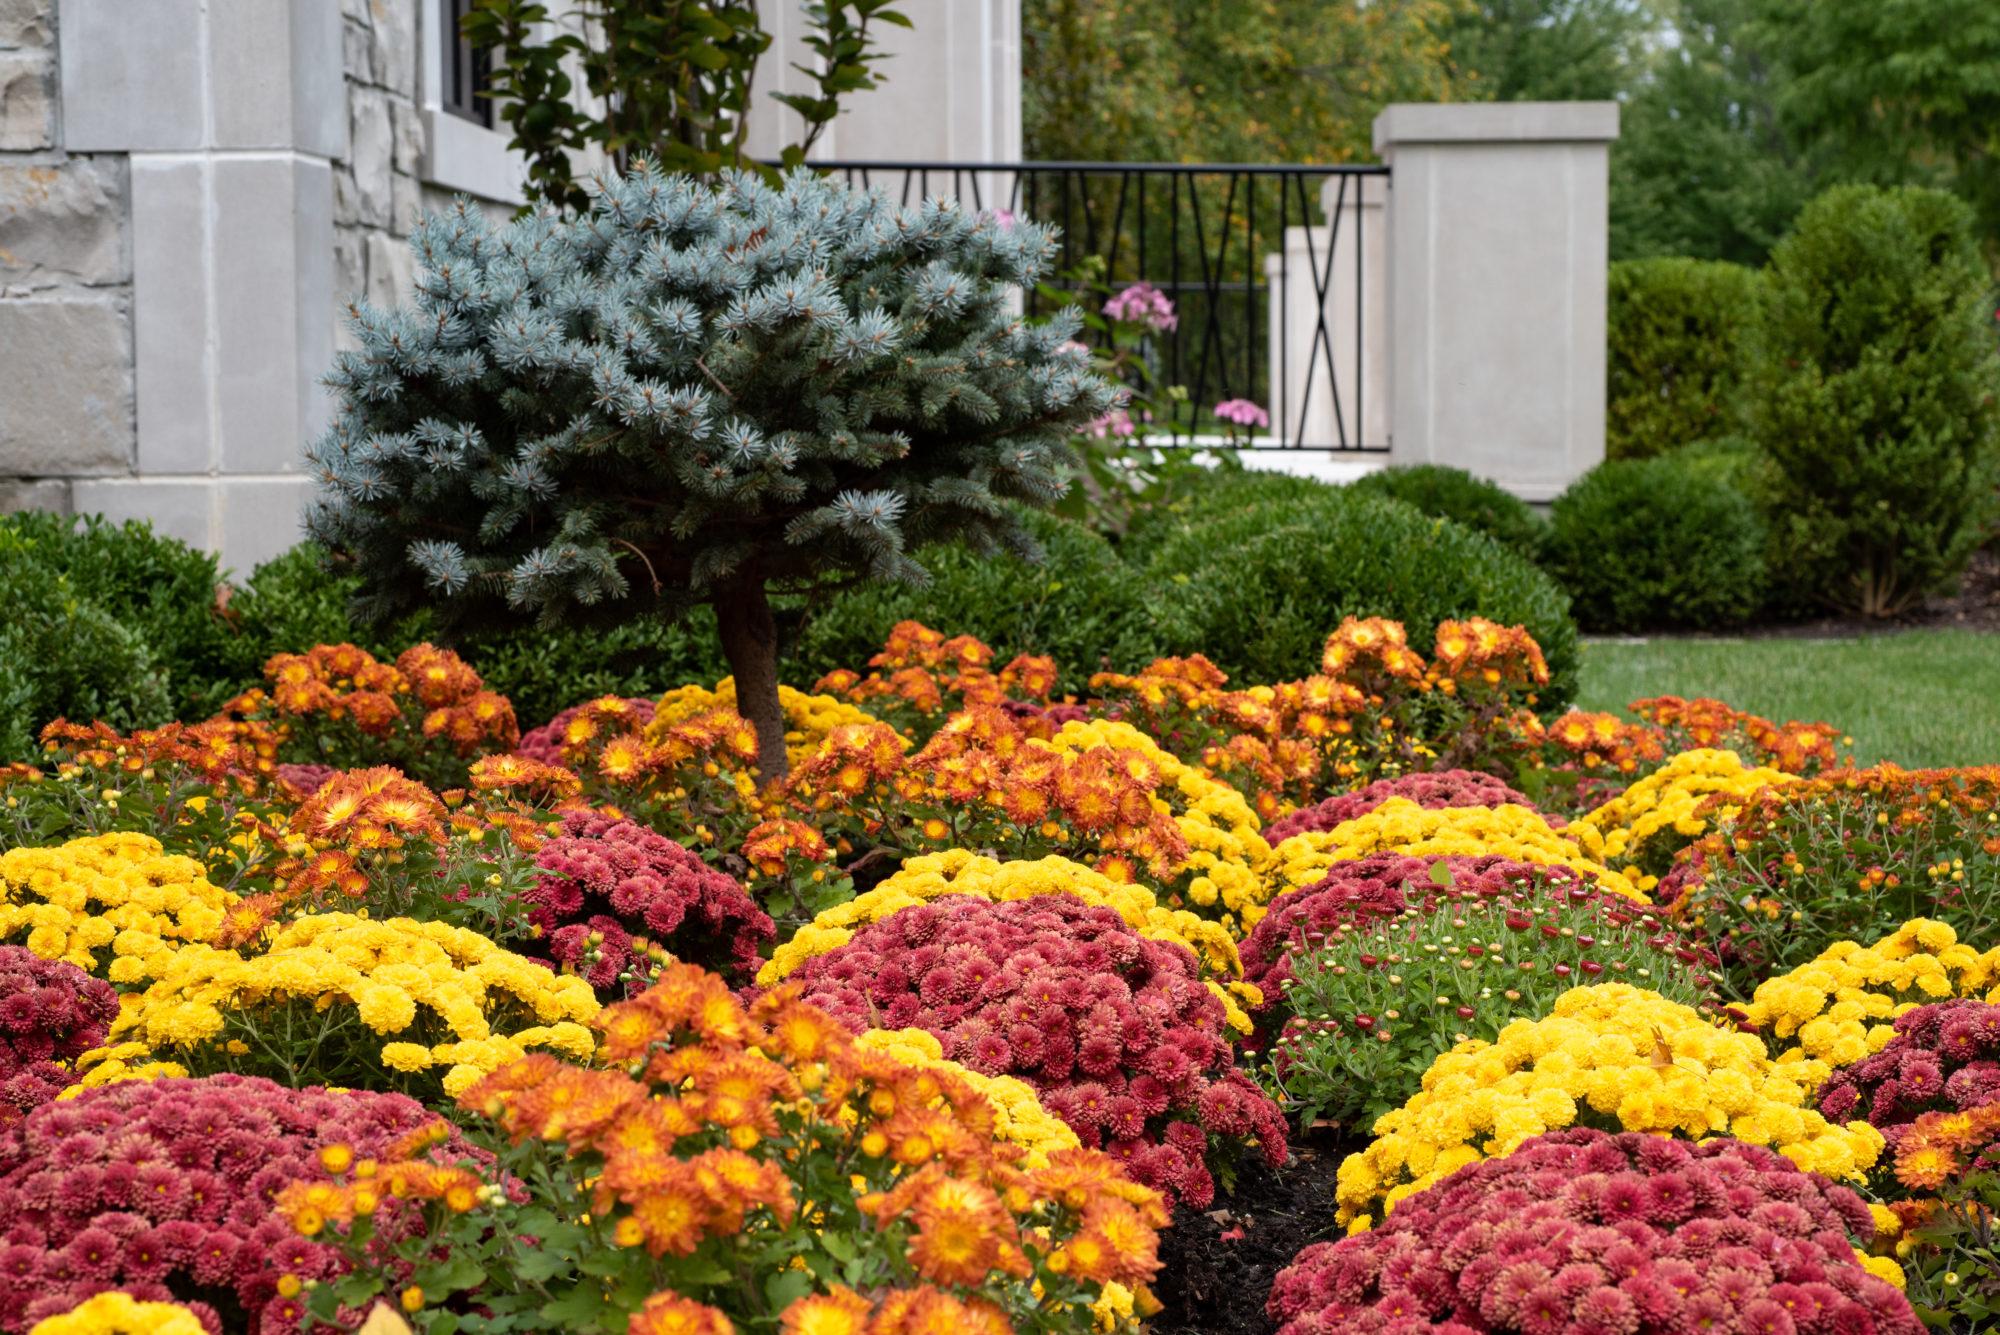 St. Louis seasonal landscaping